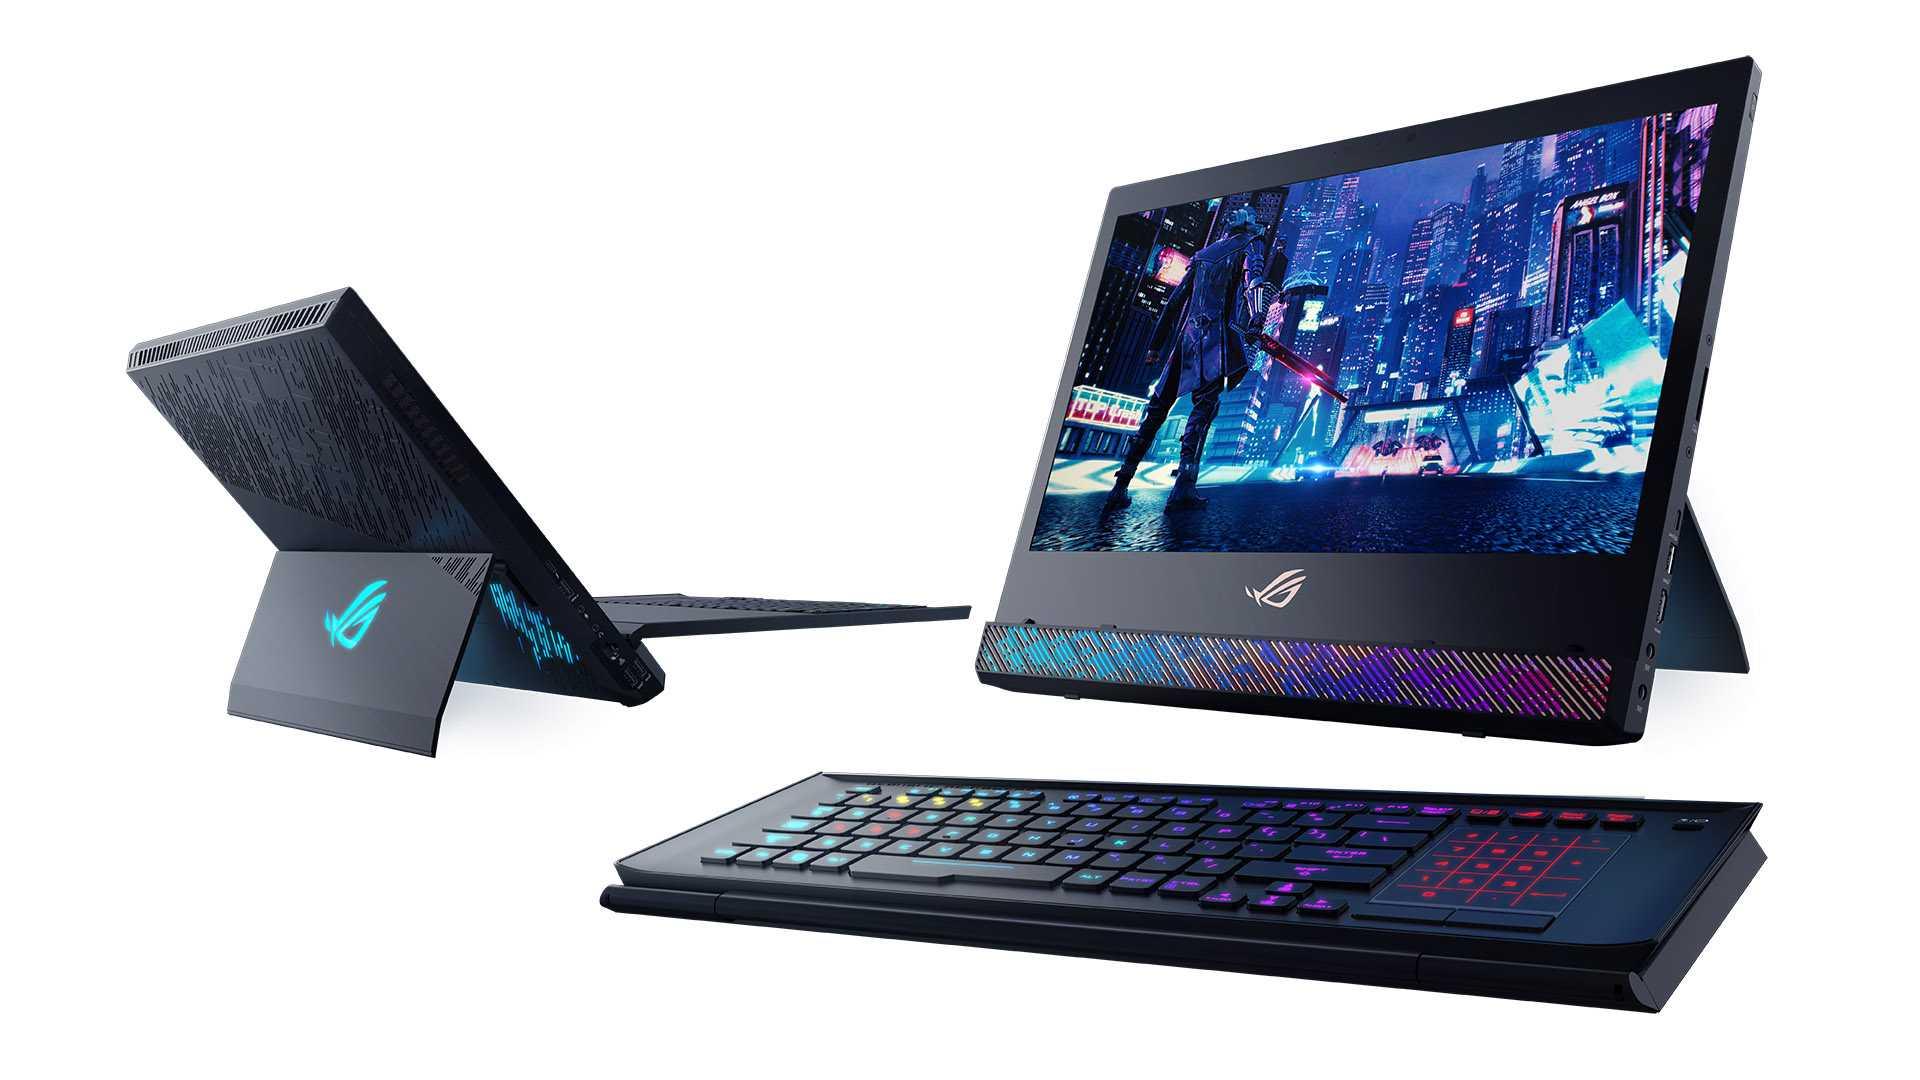 Компьютер месяца — декабрь 2020 года